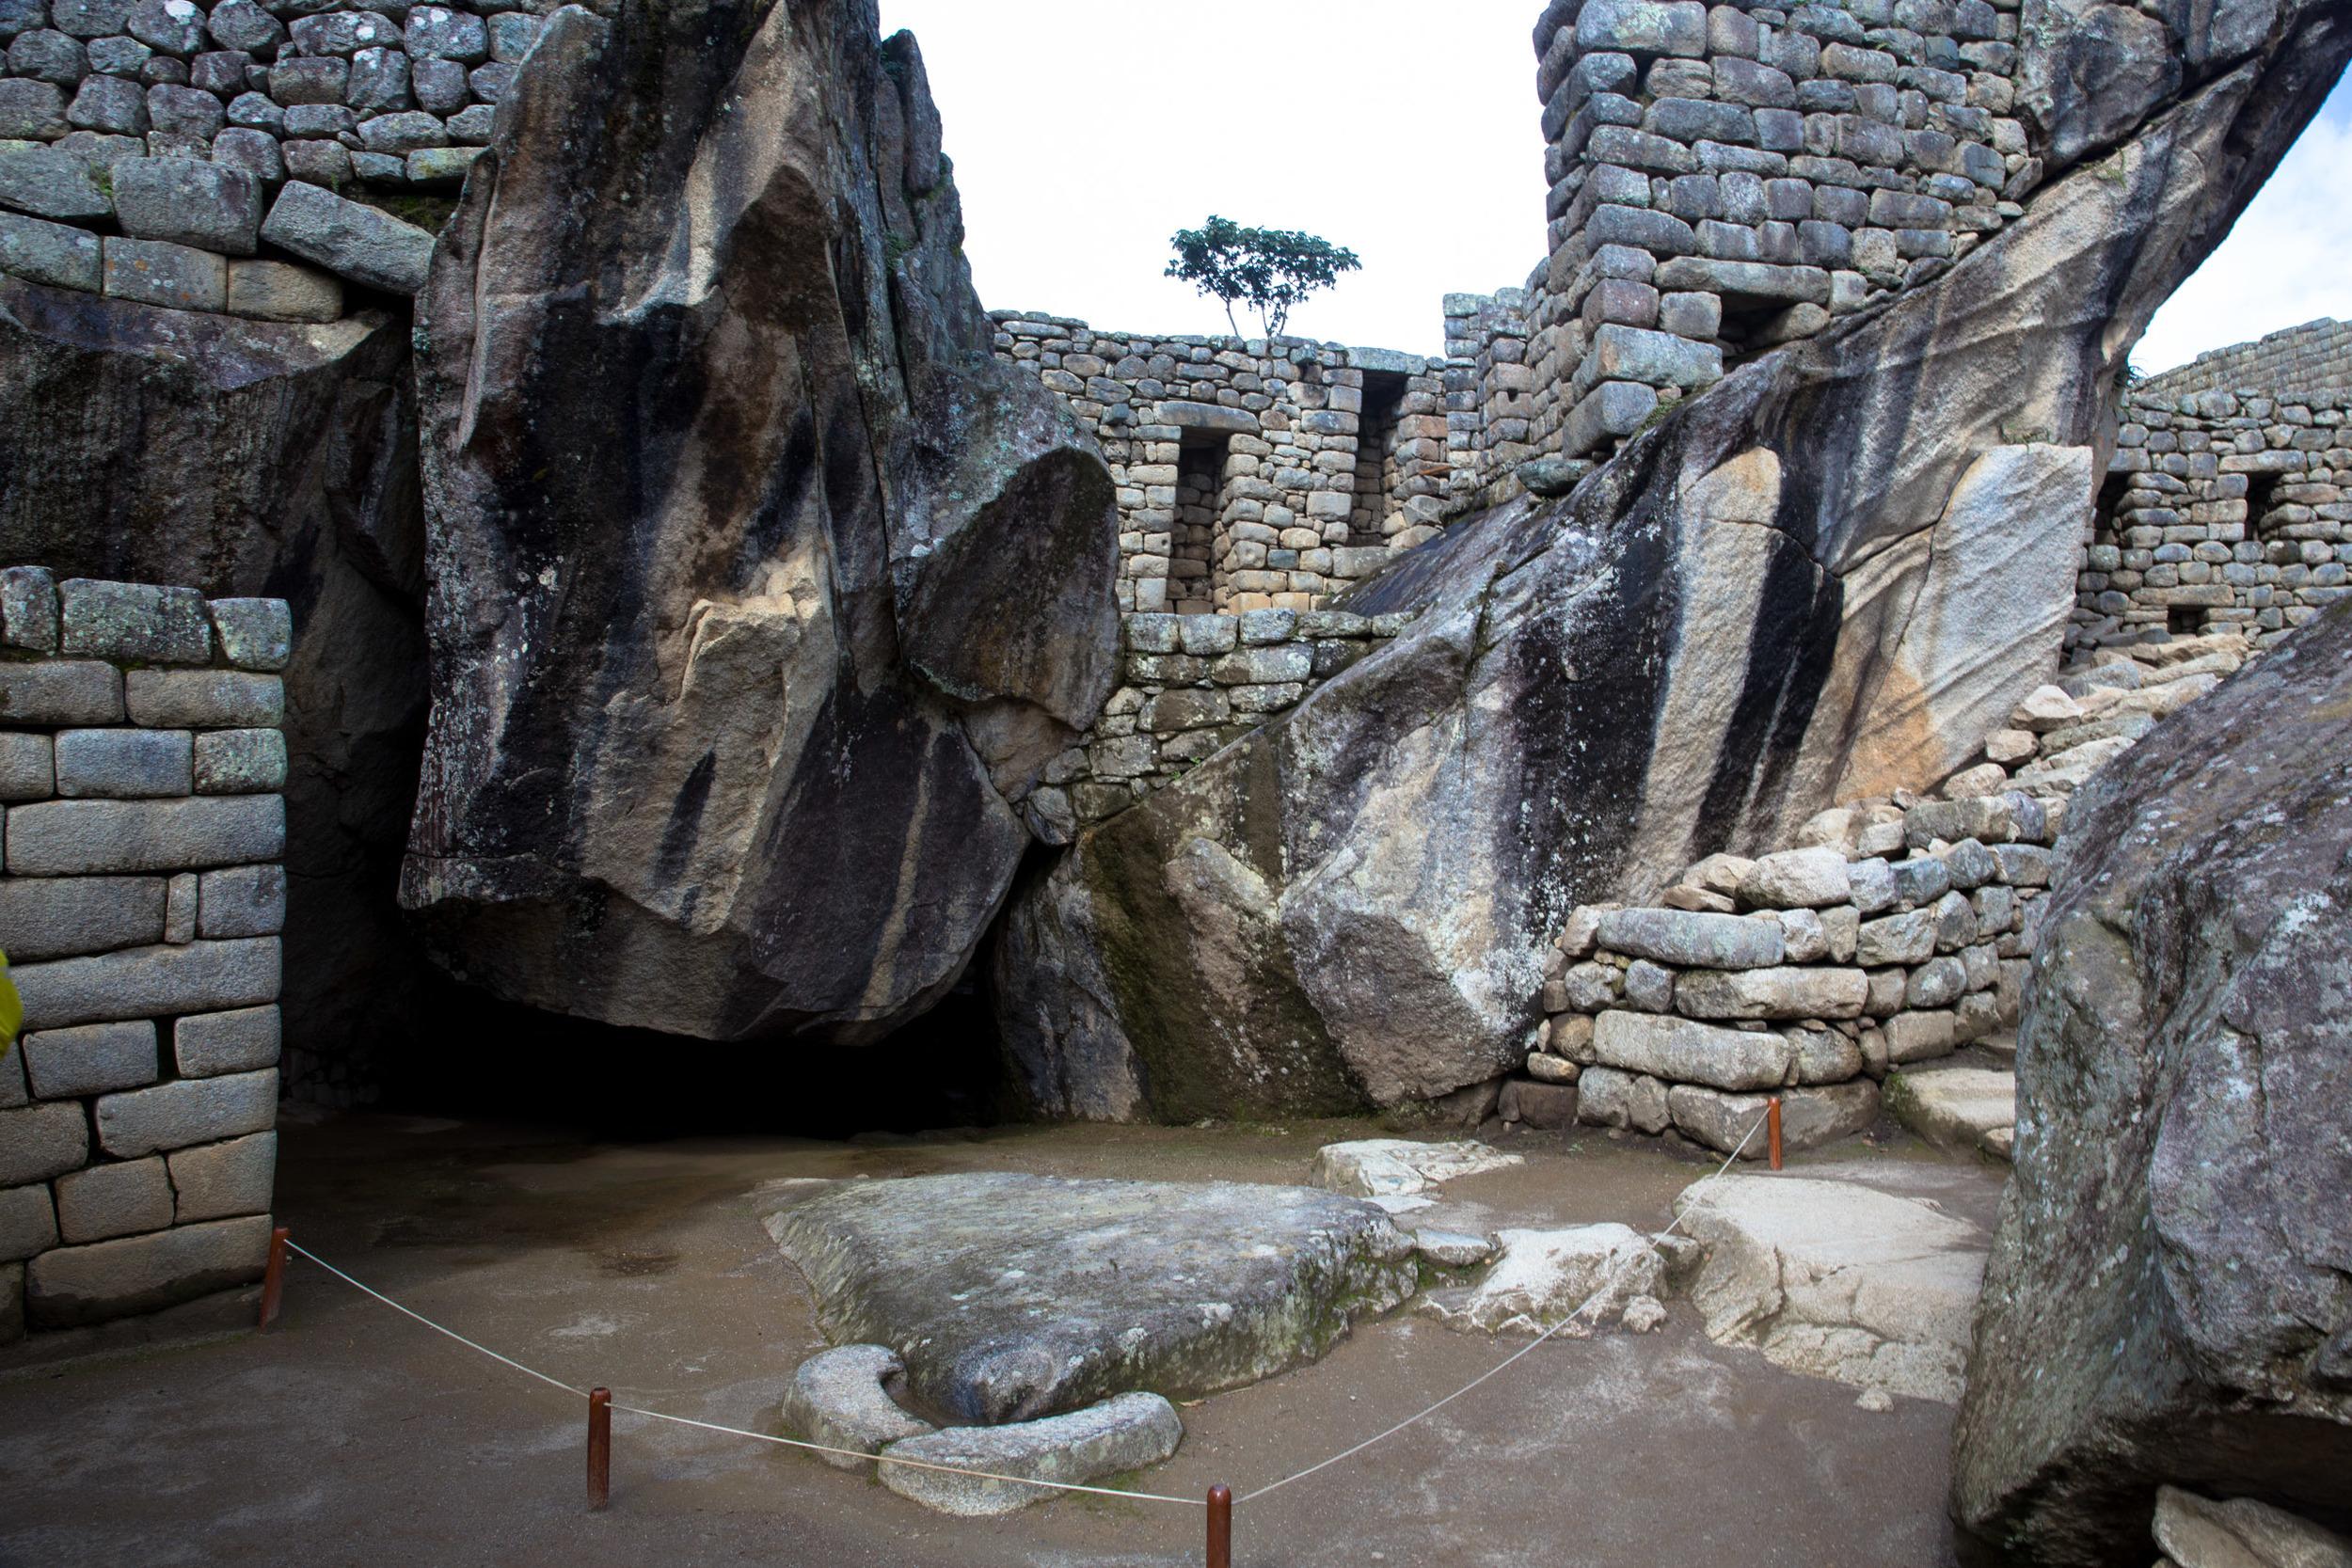 Temple of the Condor